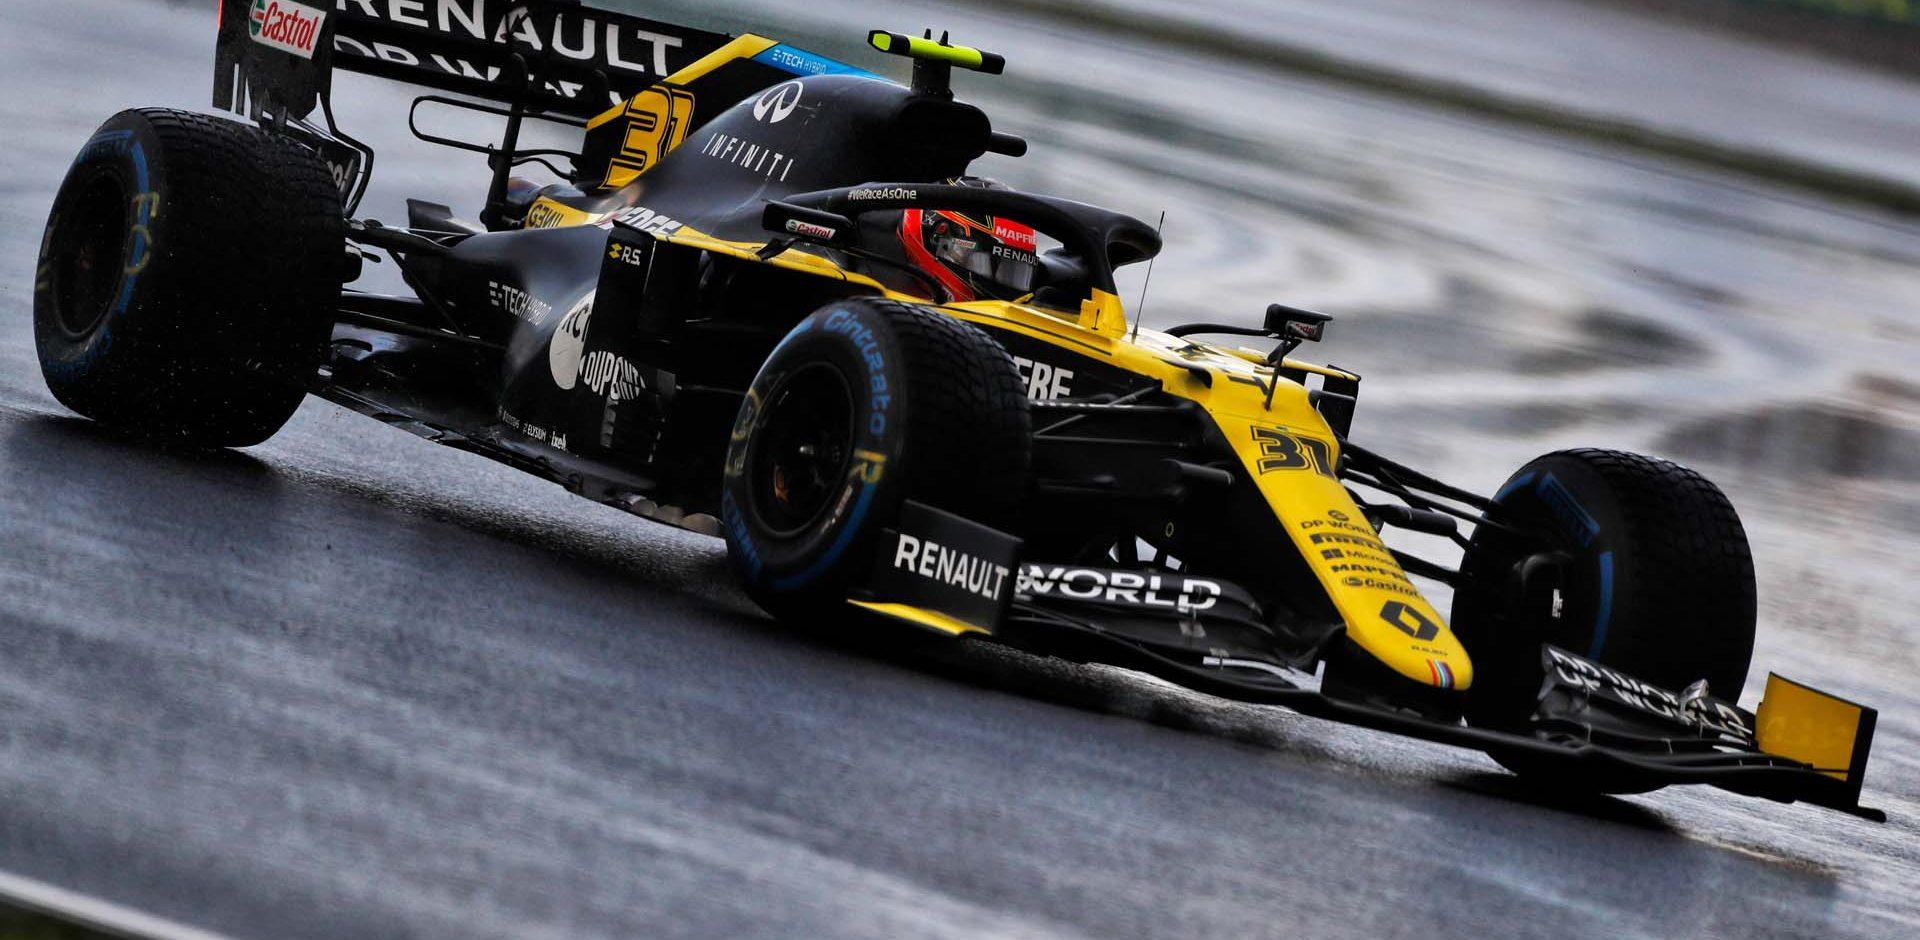 Esteban Ocon (FRA) Renault F1 Team RS20. Turkish Grand Prix, Saturday 14th November 2020. Istanbul, Turkey.